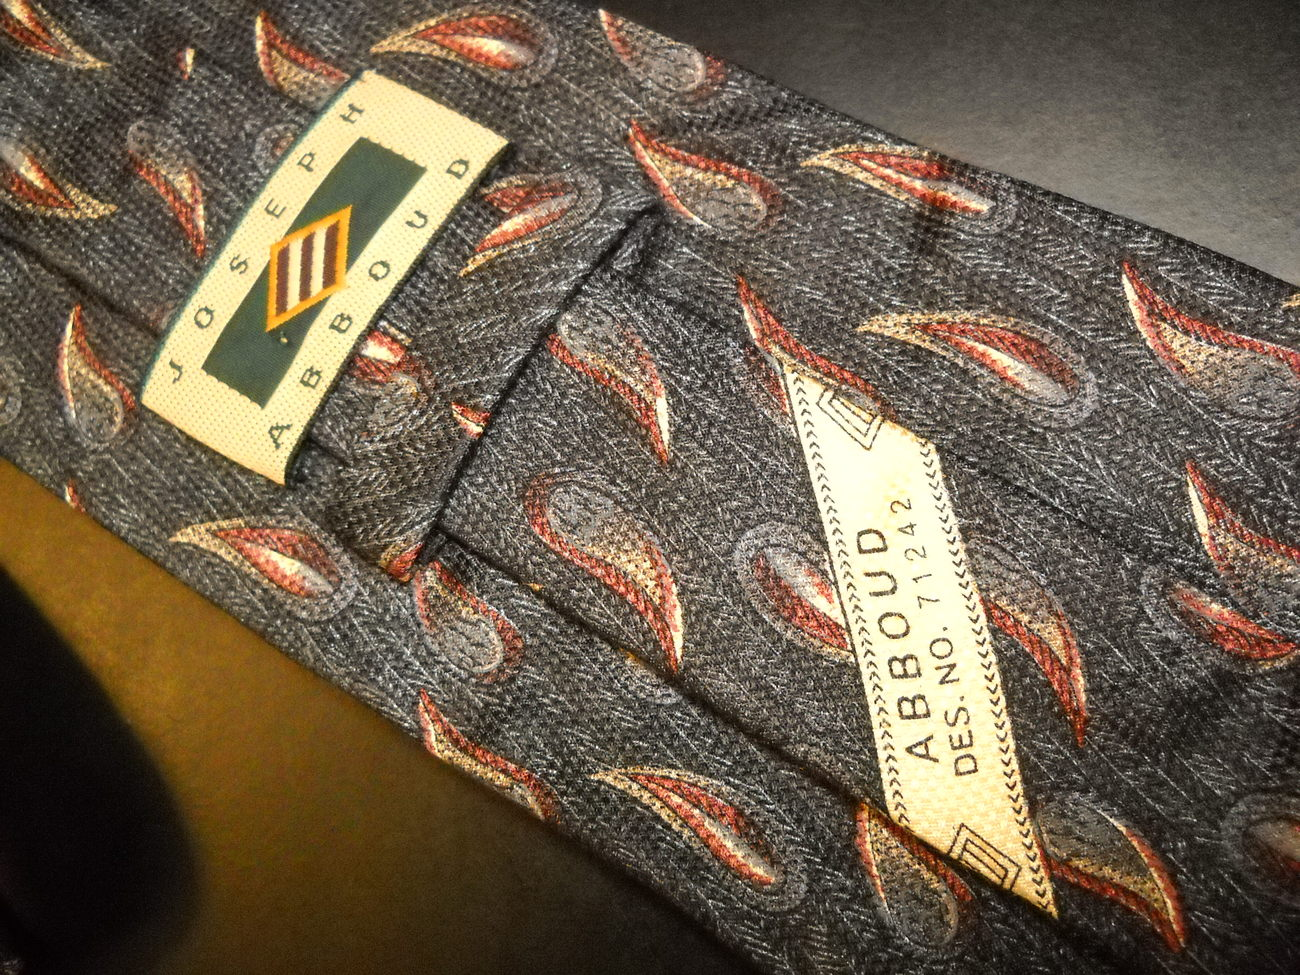 Joseph Abboud Neck Tie Design No 71242 Black Greys Italian Leaves of Browns Gold